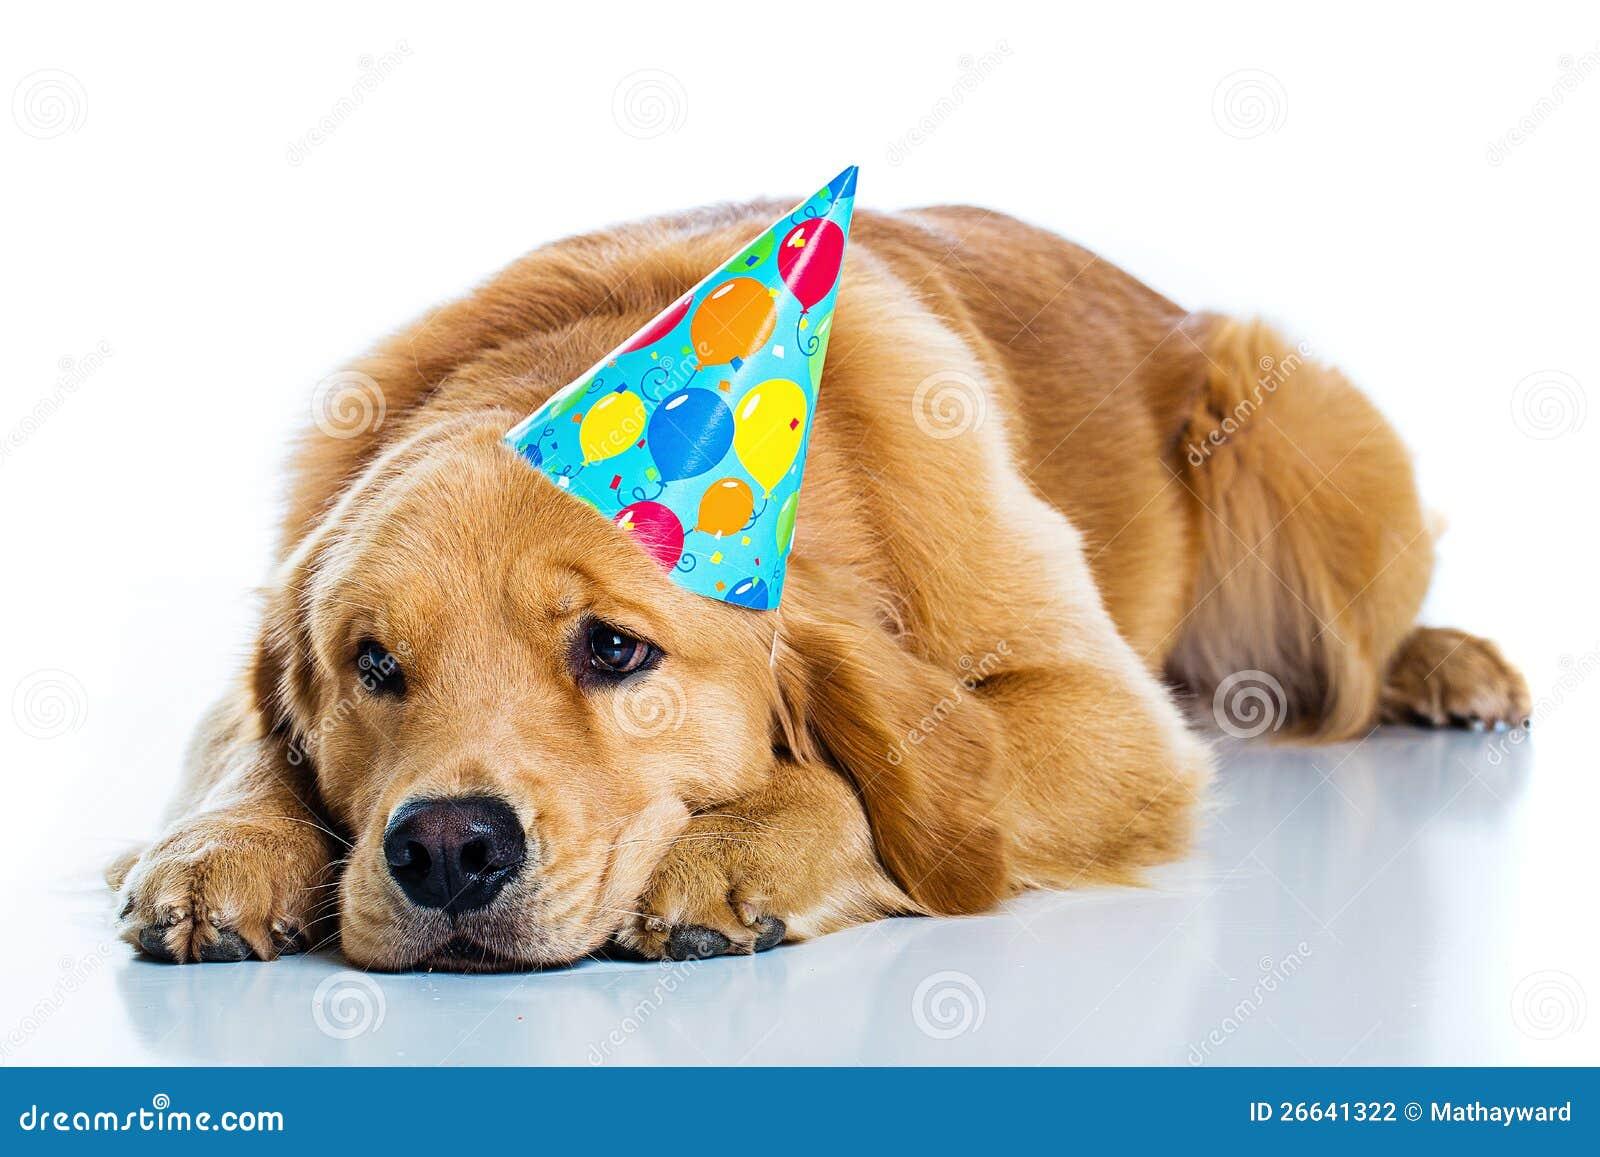 Sad Dog Birthday Party Stock Images